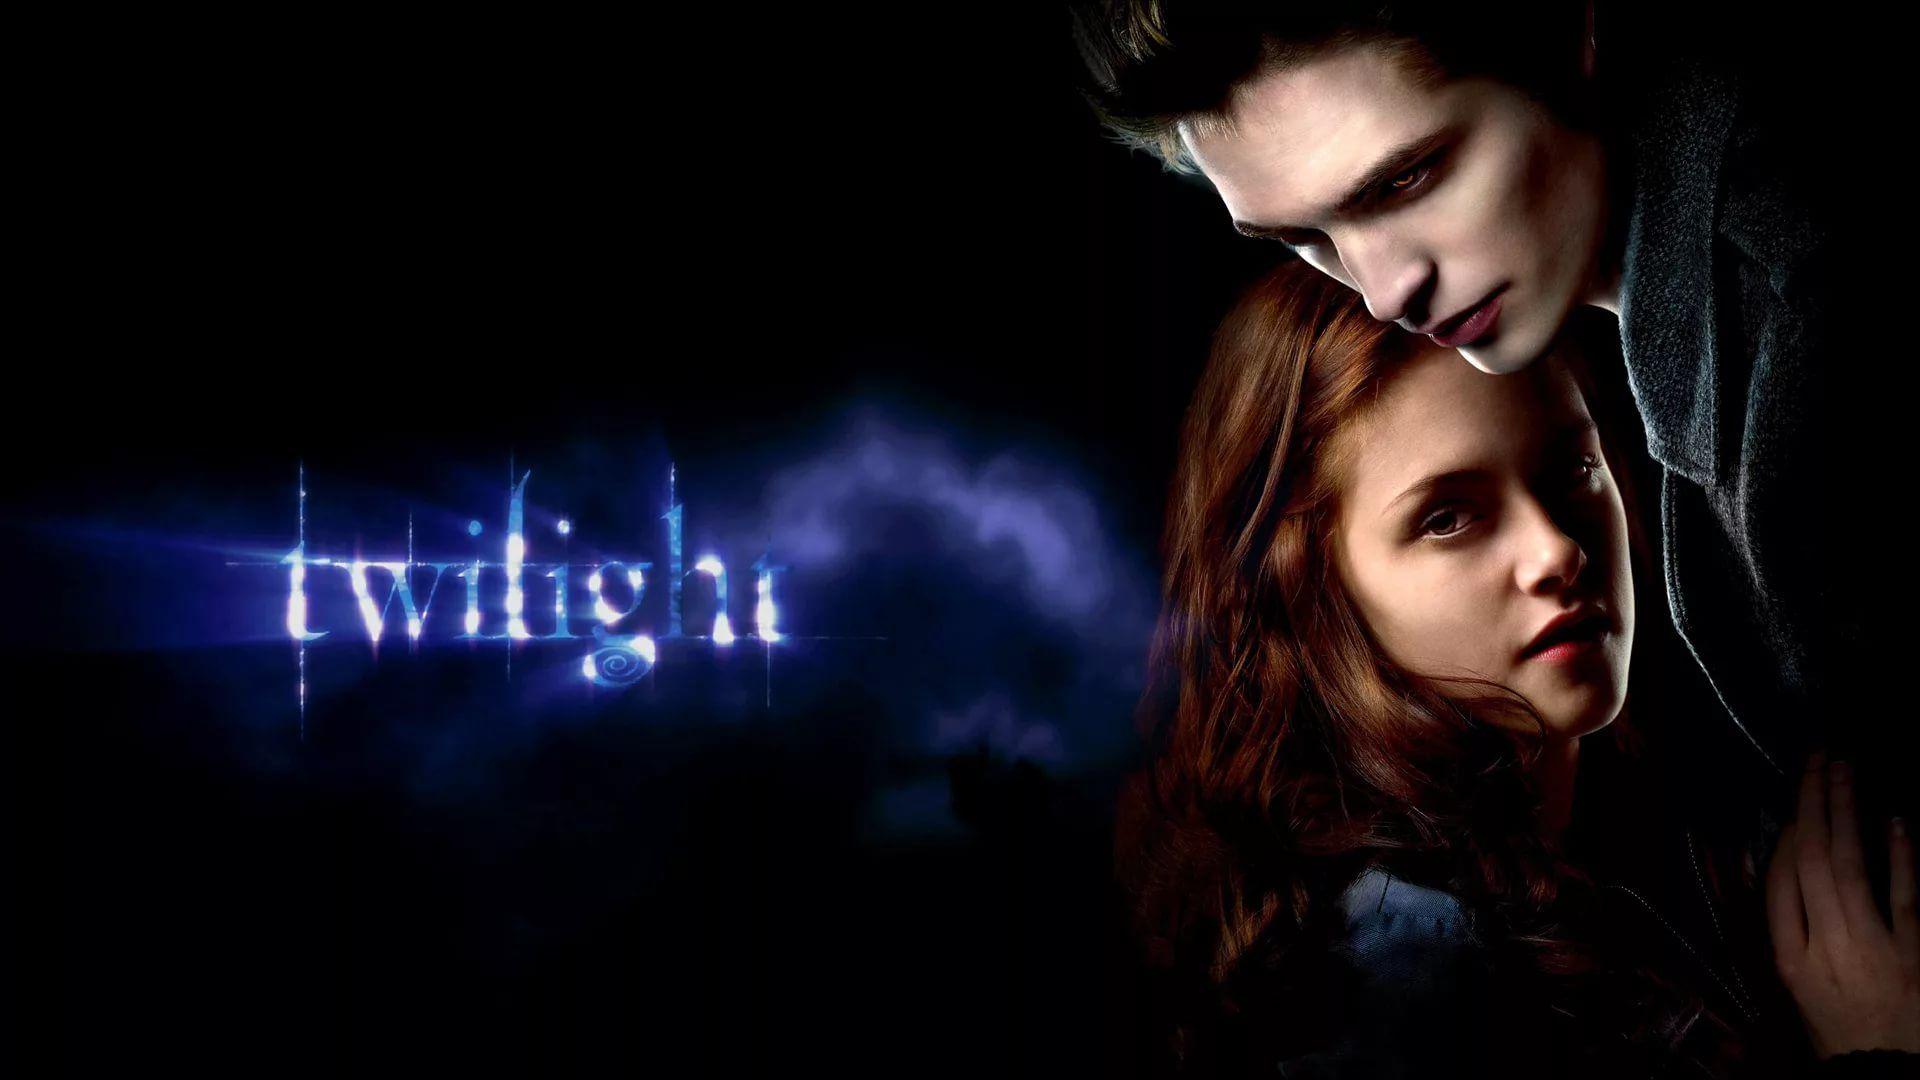 Twilight Saga Cool HD Wallpaper